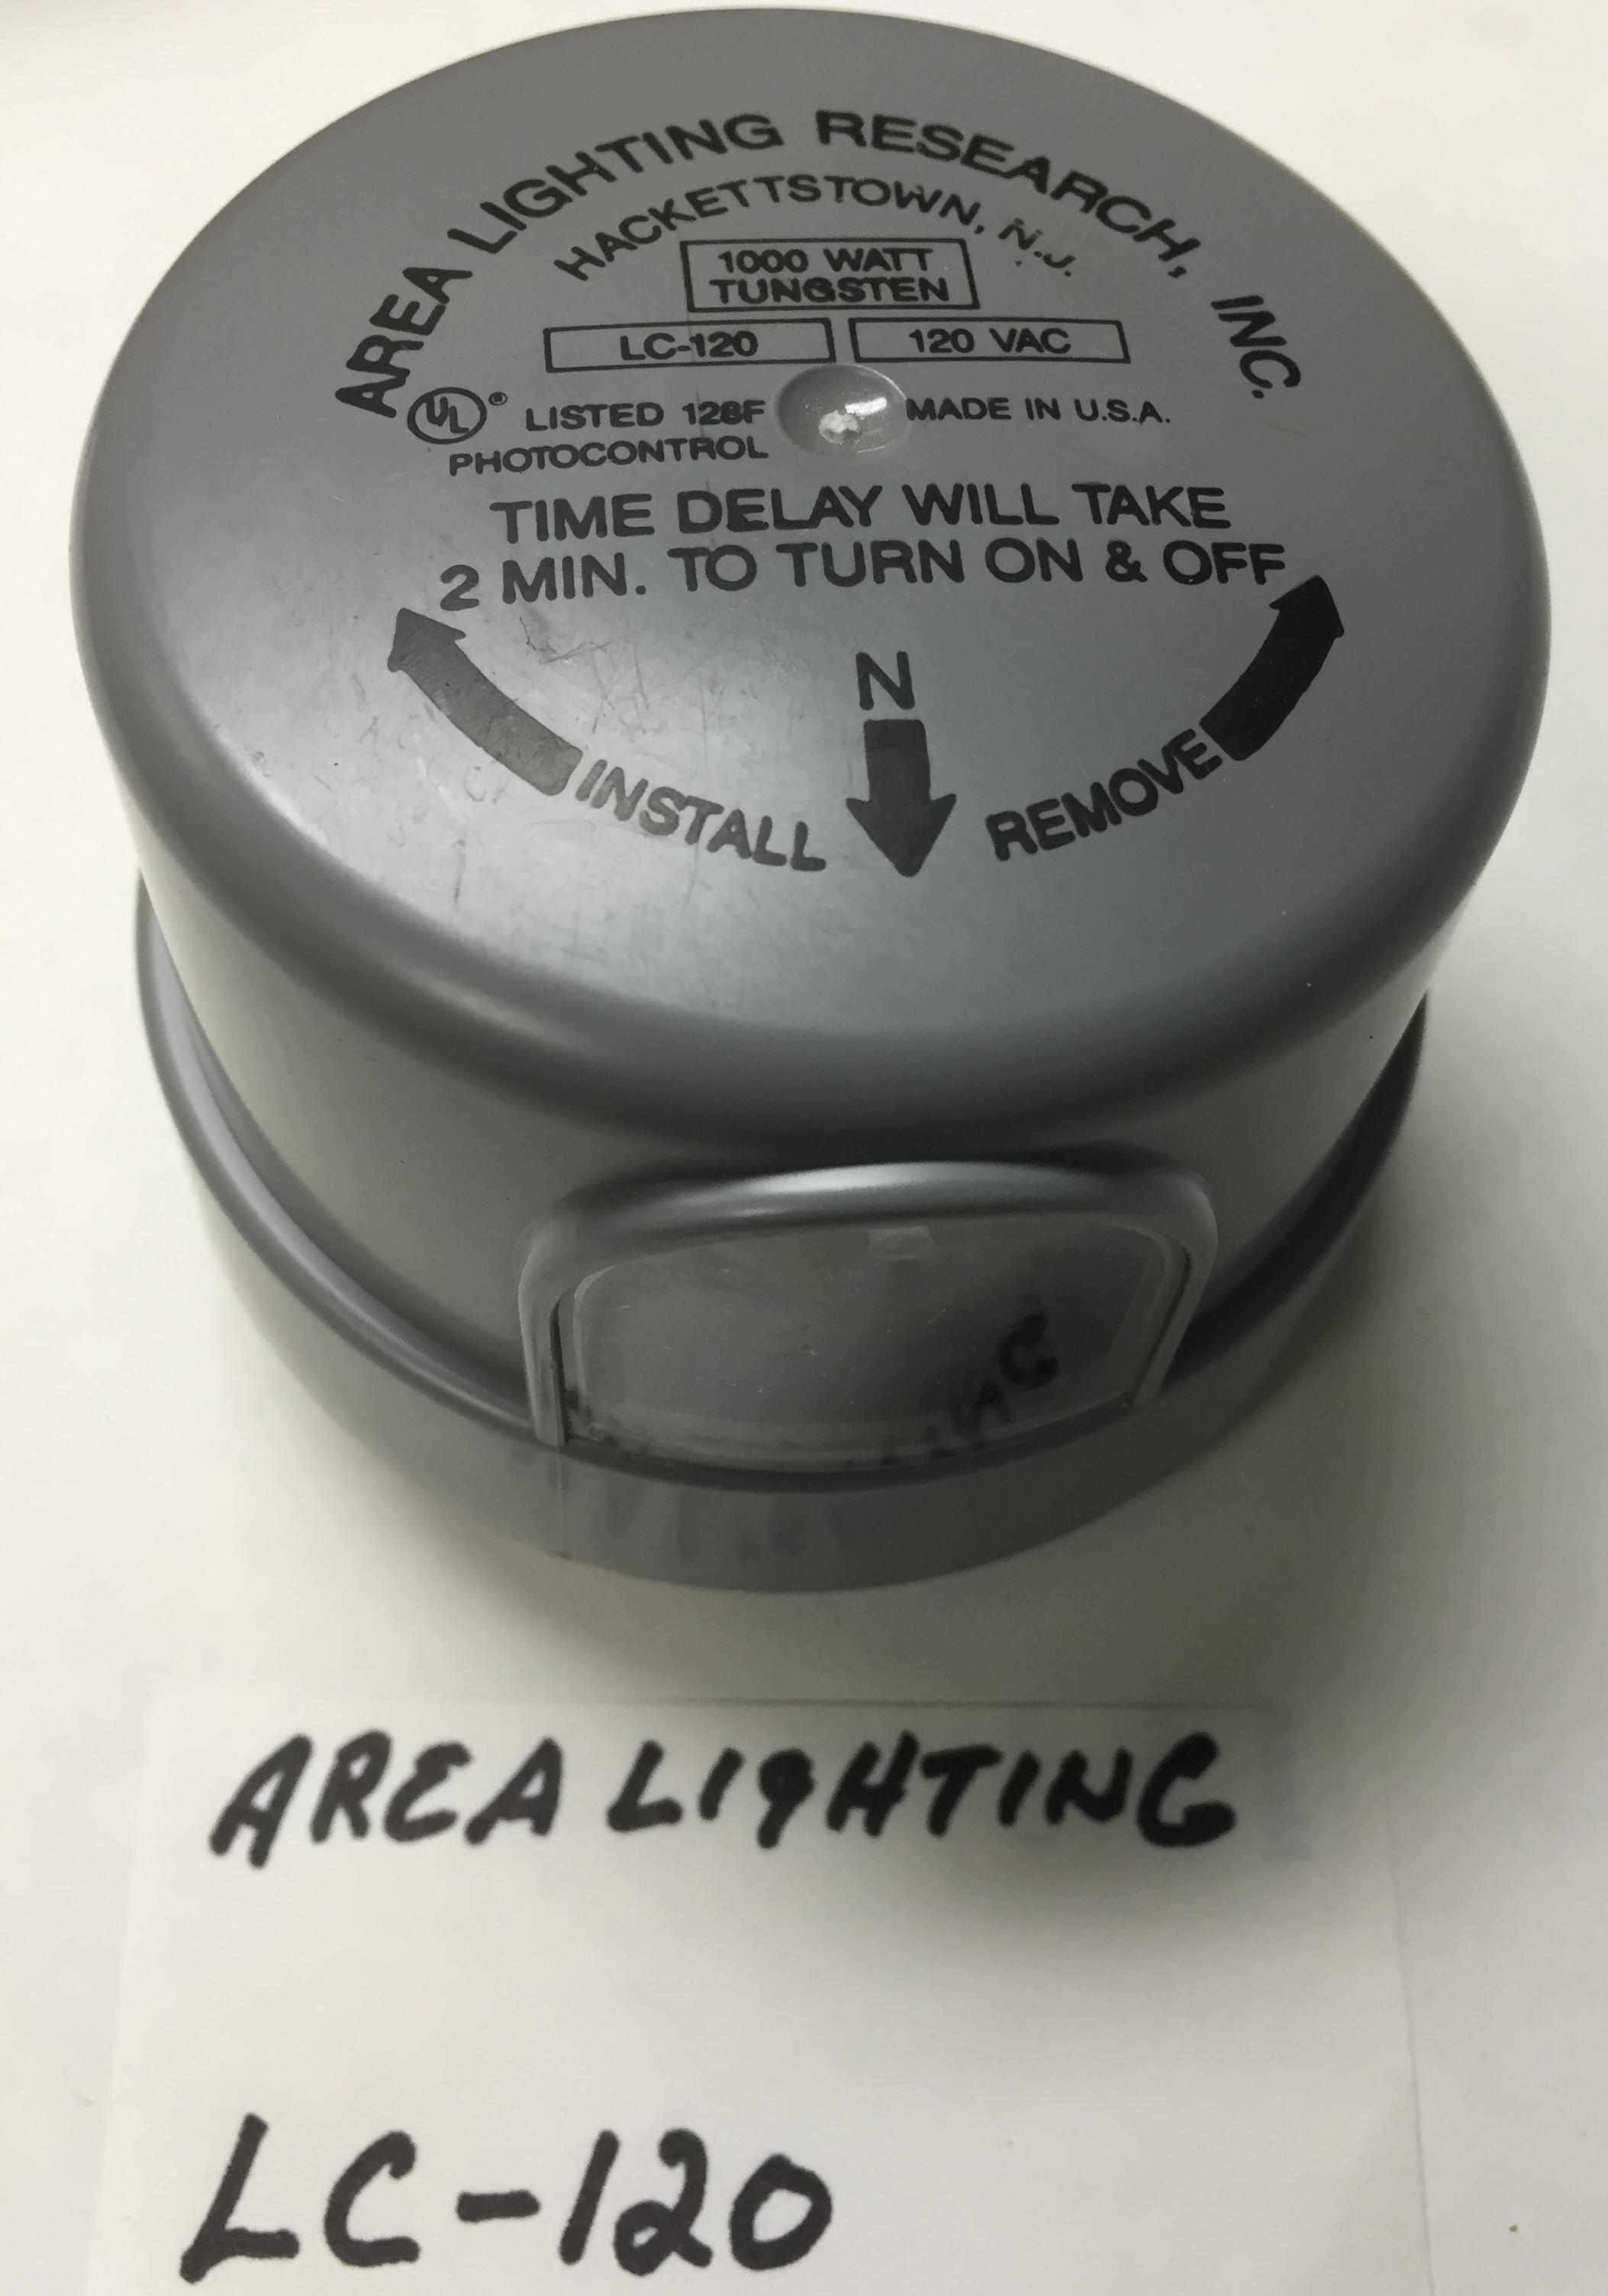 photo control area lighting lc 120